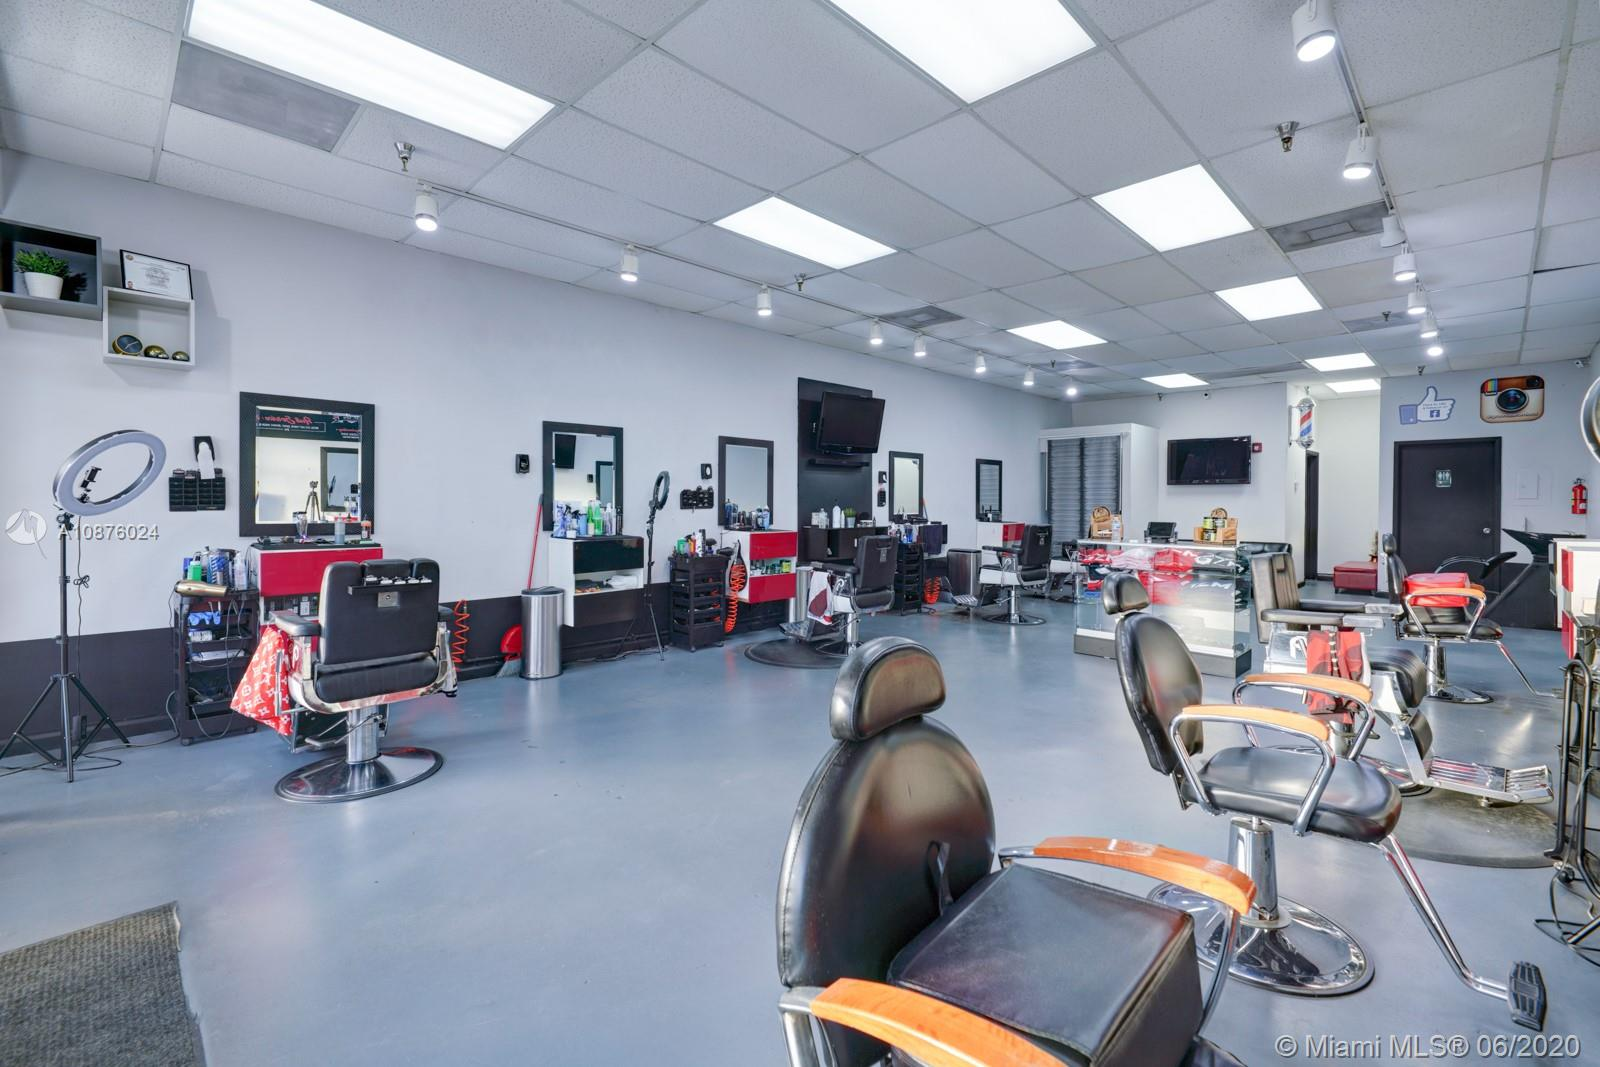 southland mall nail salon